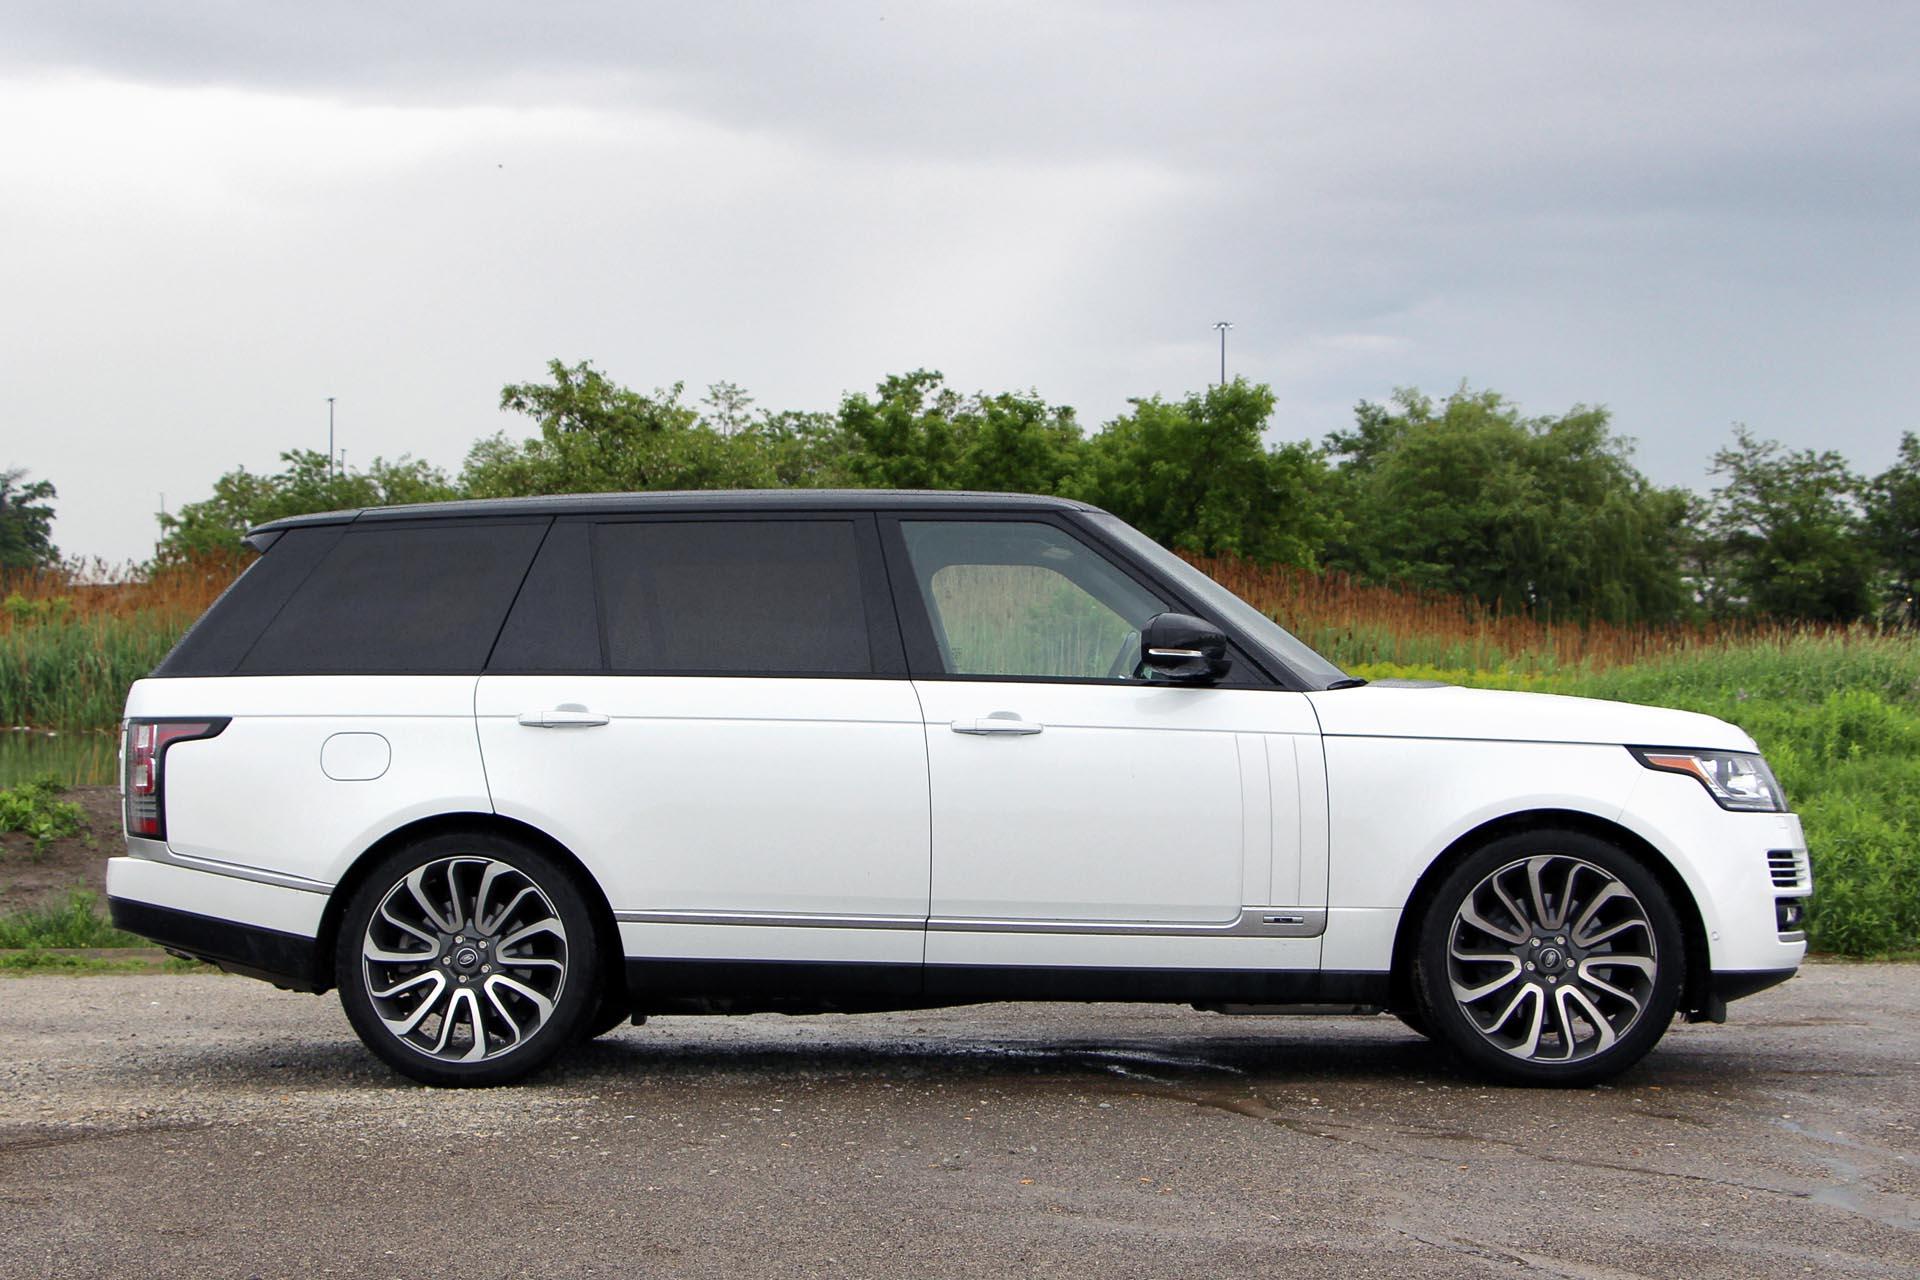 2015 Land Rover Range Rover Autobiography LWB Autos